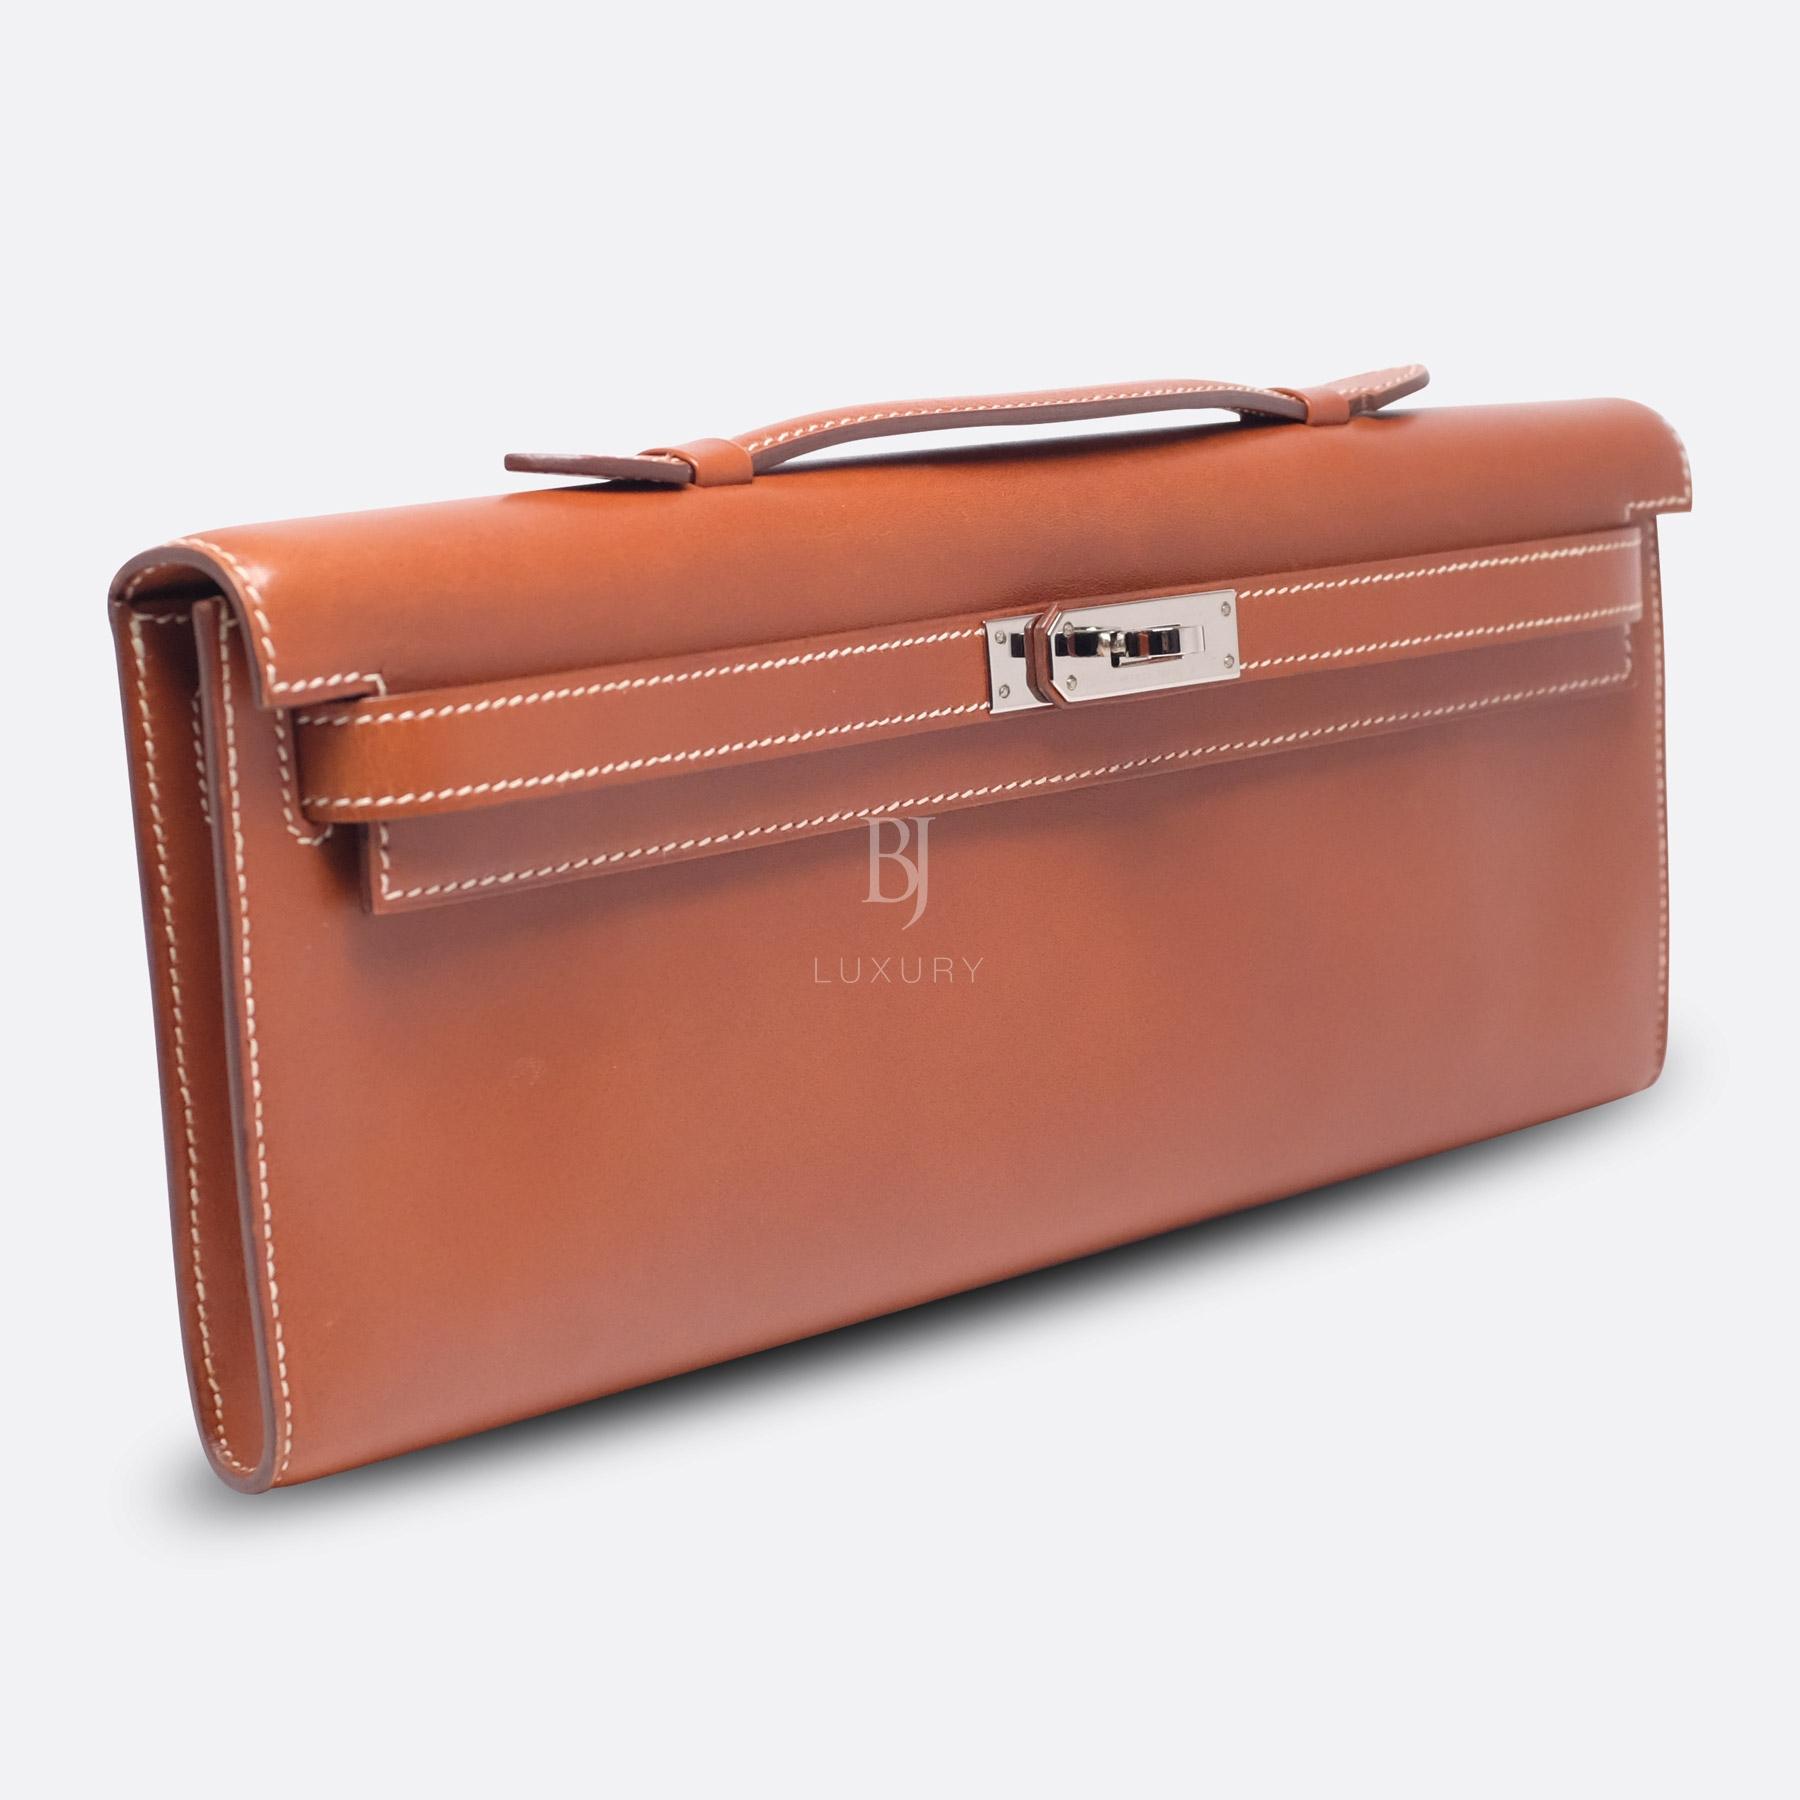 Hermes-Kelly-Cut-Gold-Tadelakt-Palladium-Hardware-BJ-Luxury-Main-Image.jpg